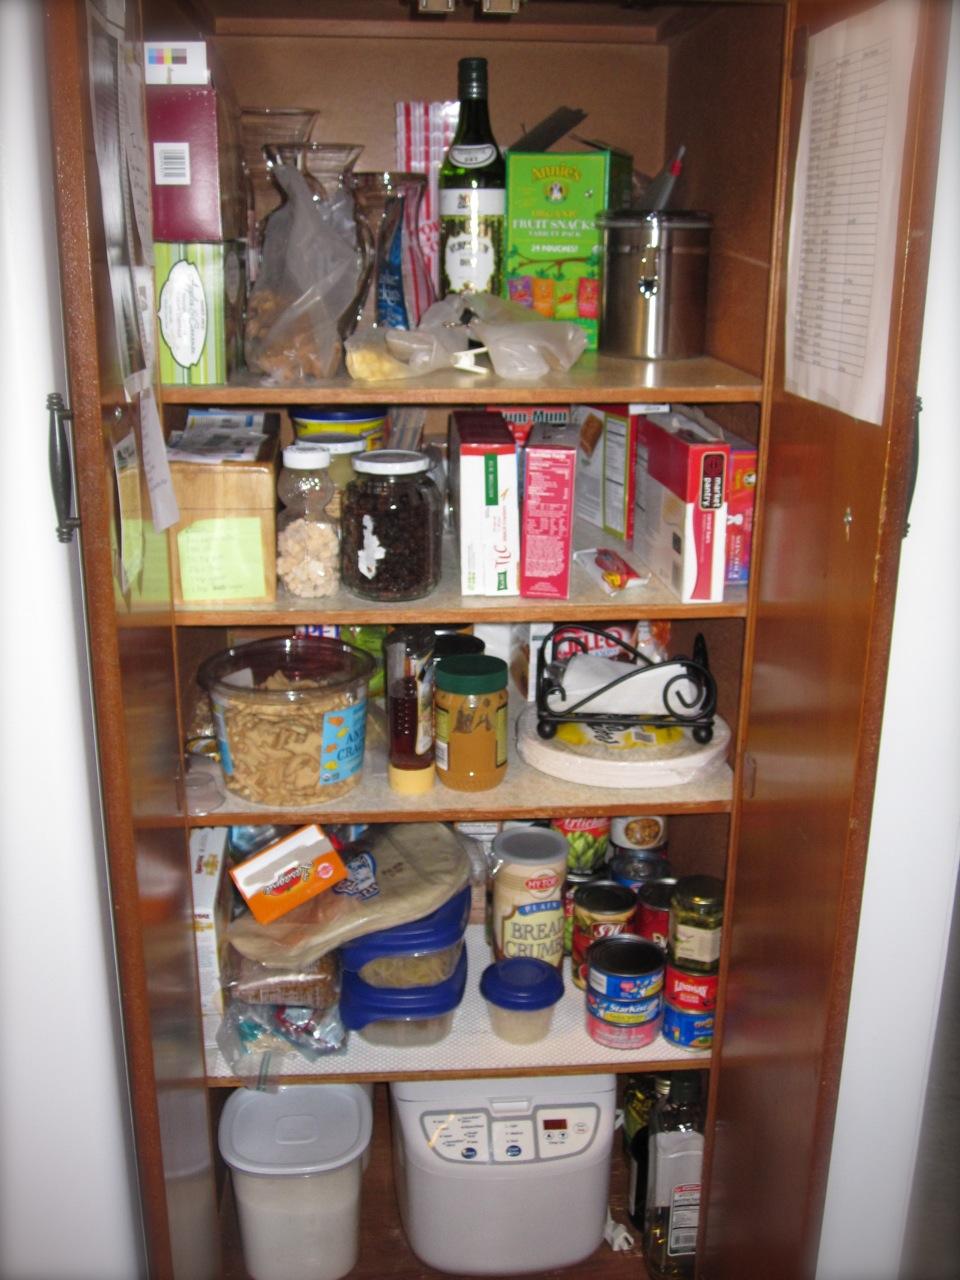 How to Organize Deep Shelves - Ask Anna